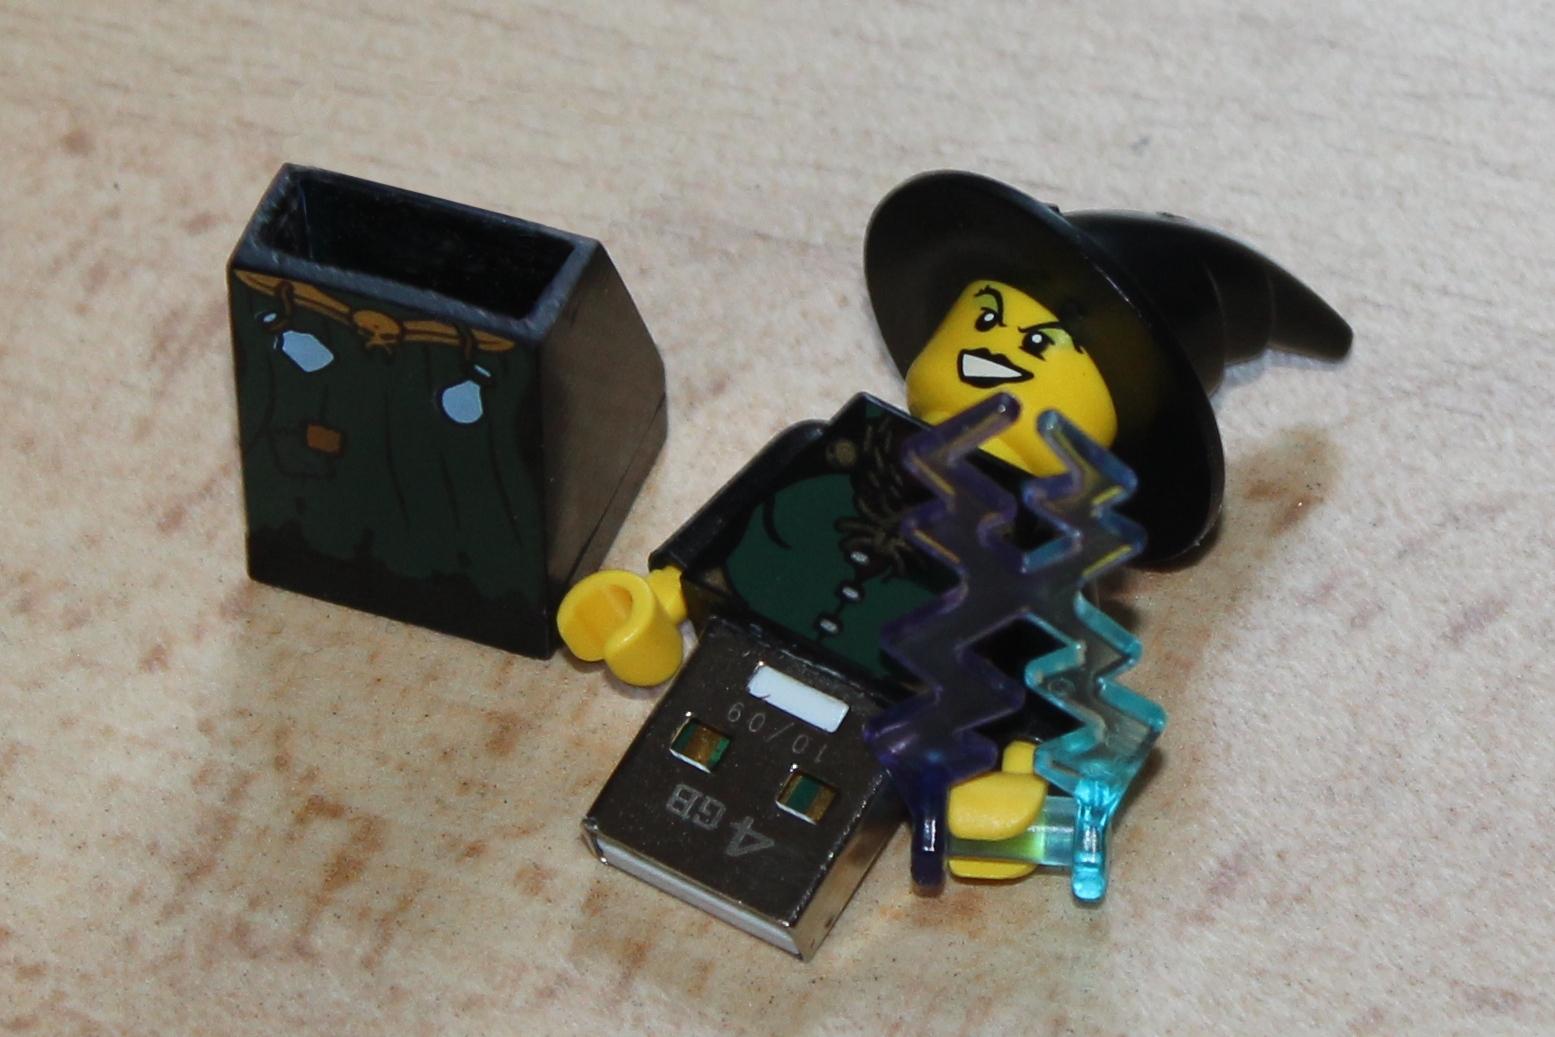 Lego figure USB drive